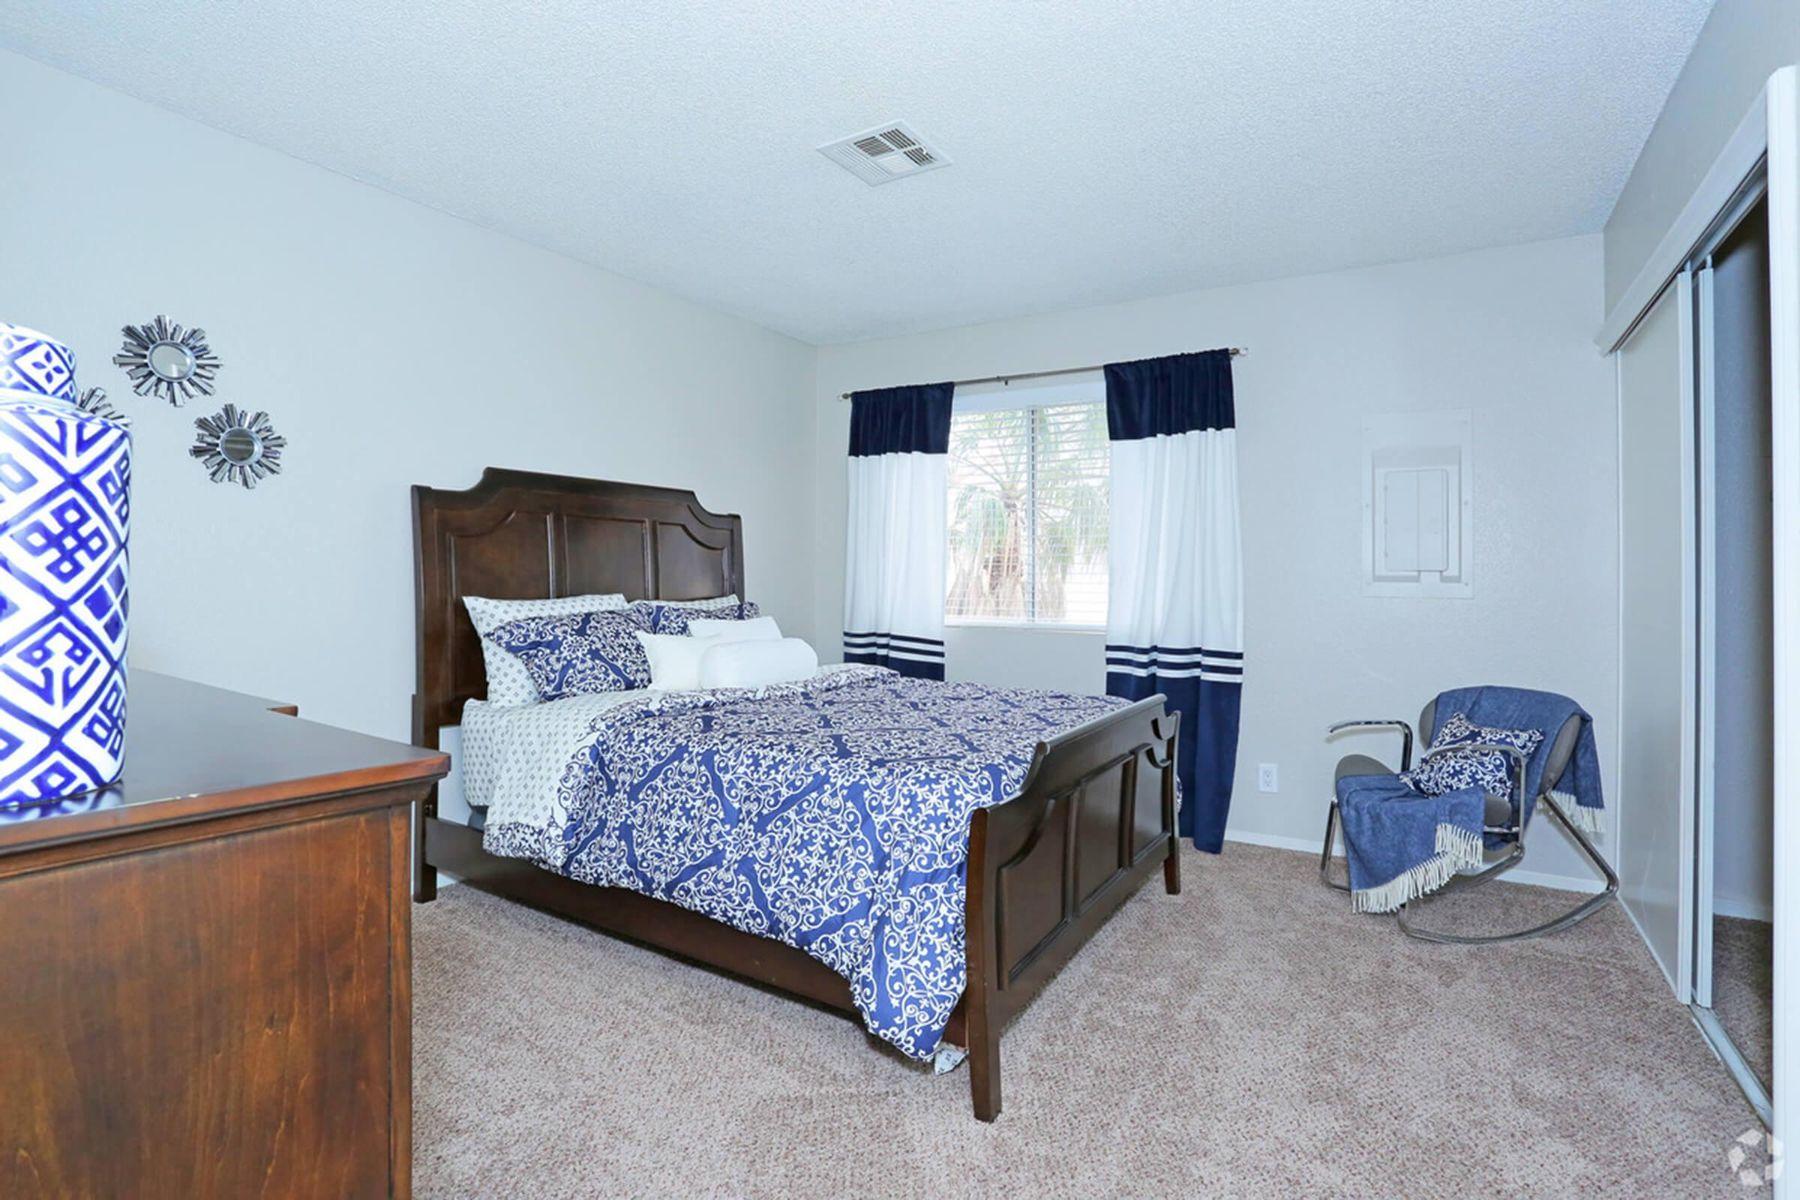 sunset-hills-apartments-henderson-nv-2br-2ba---960-sf-bedroom (1).jpg